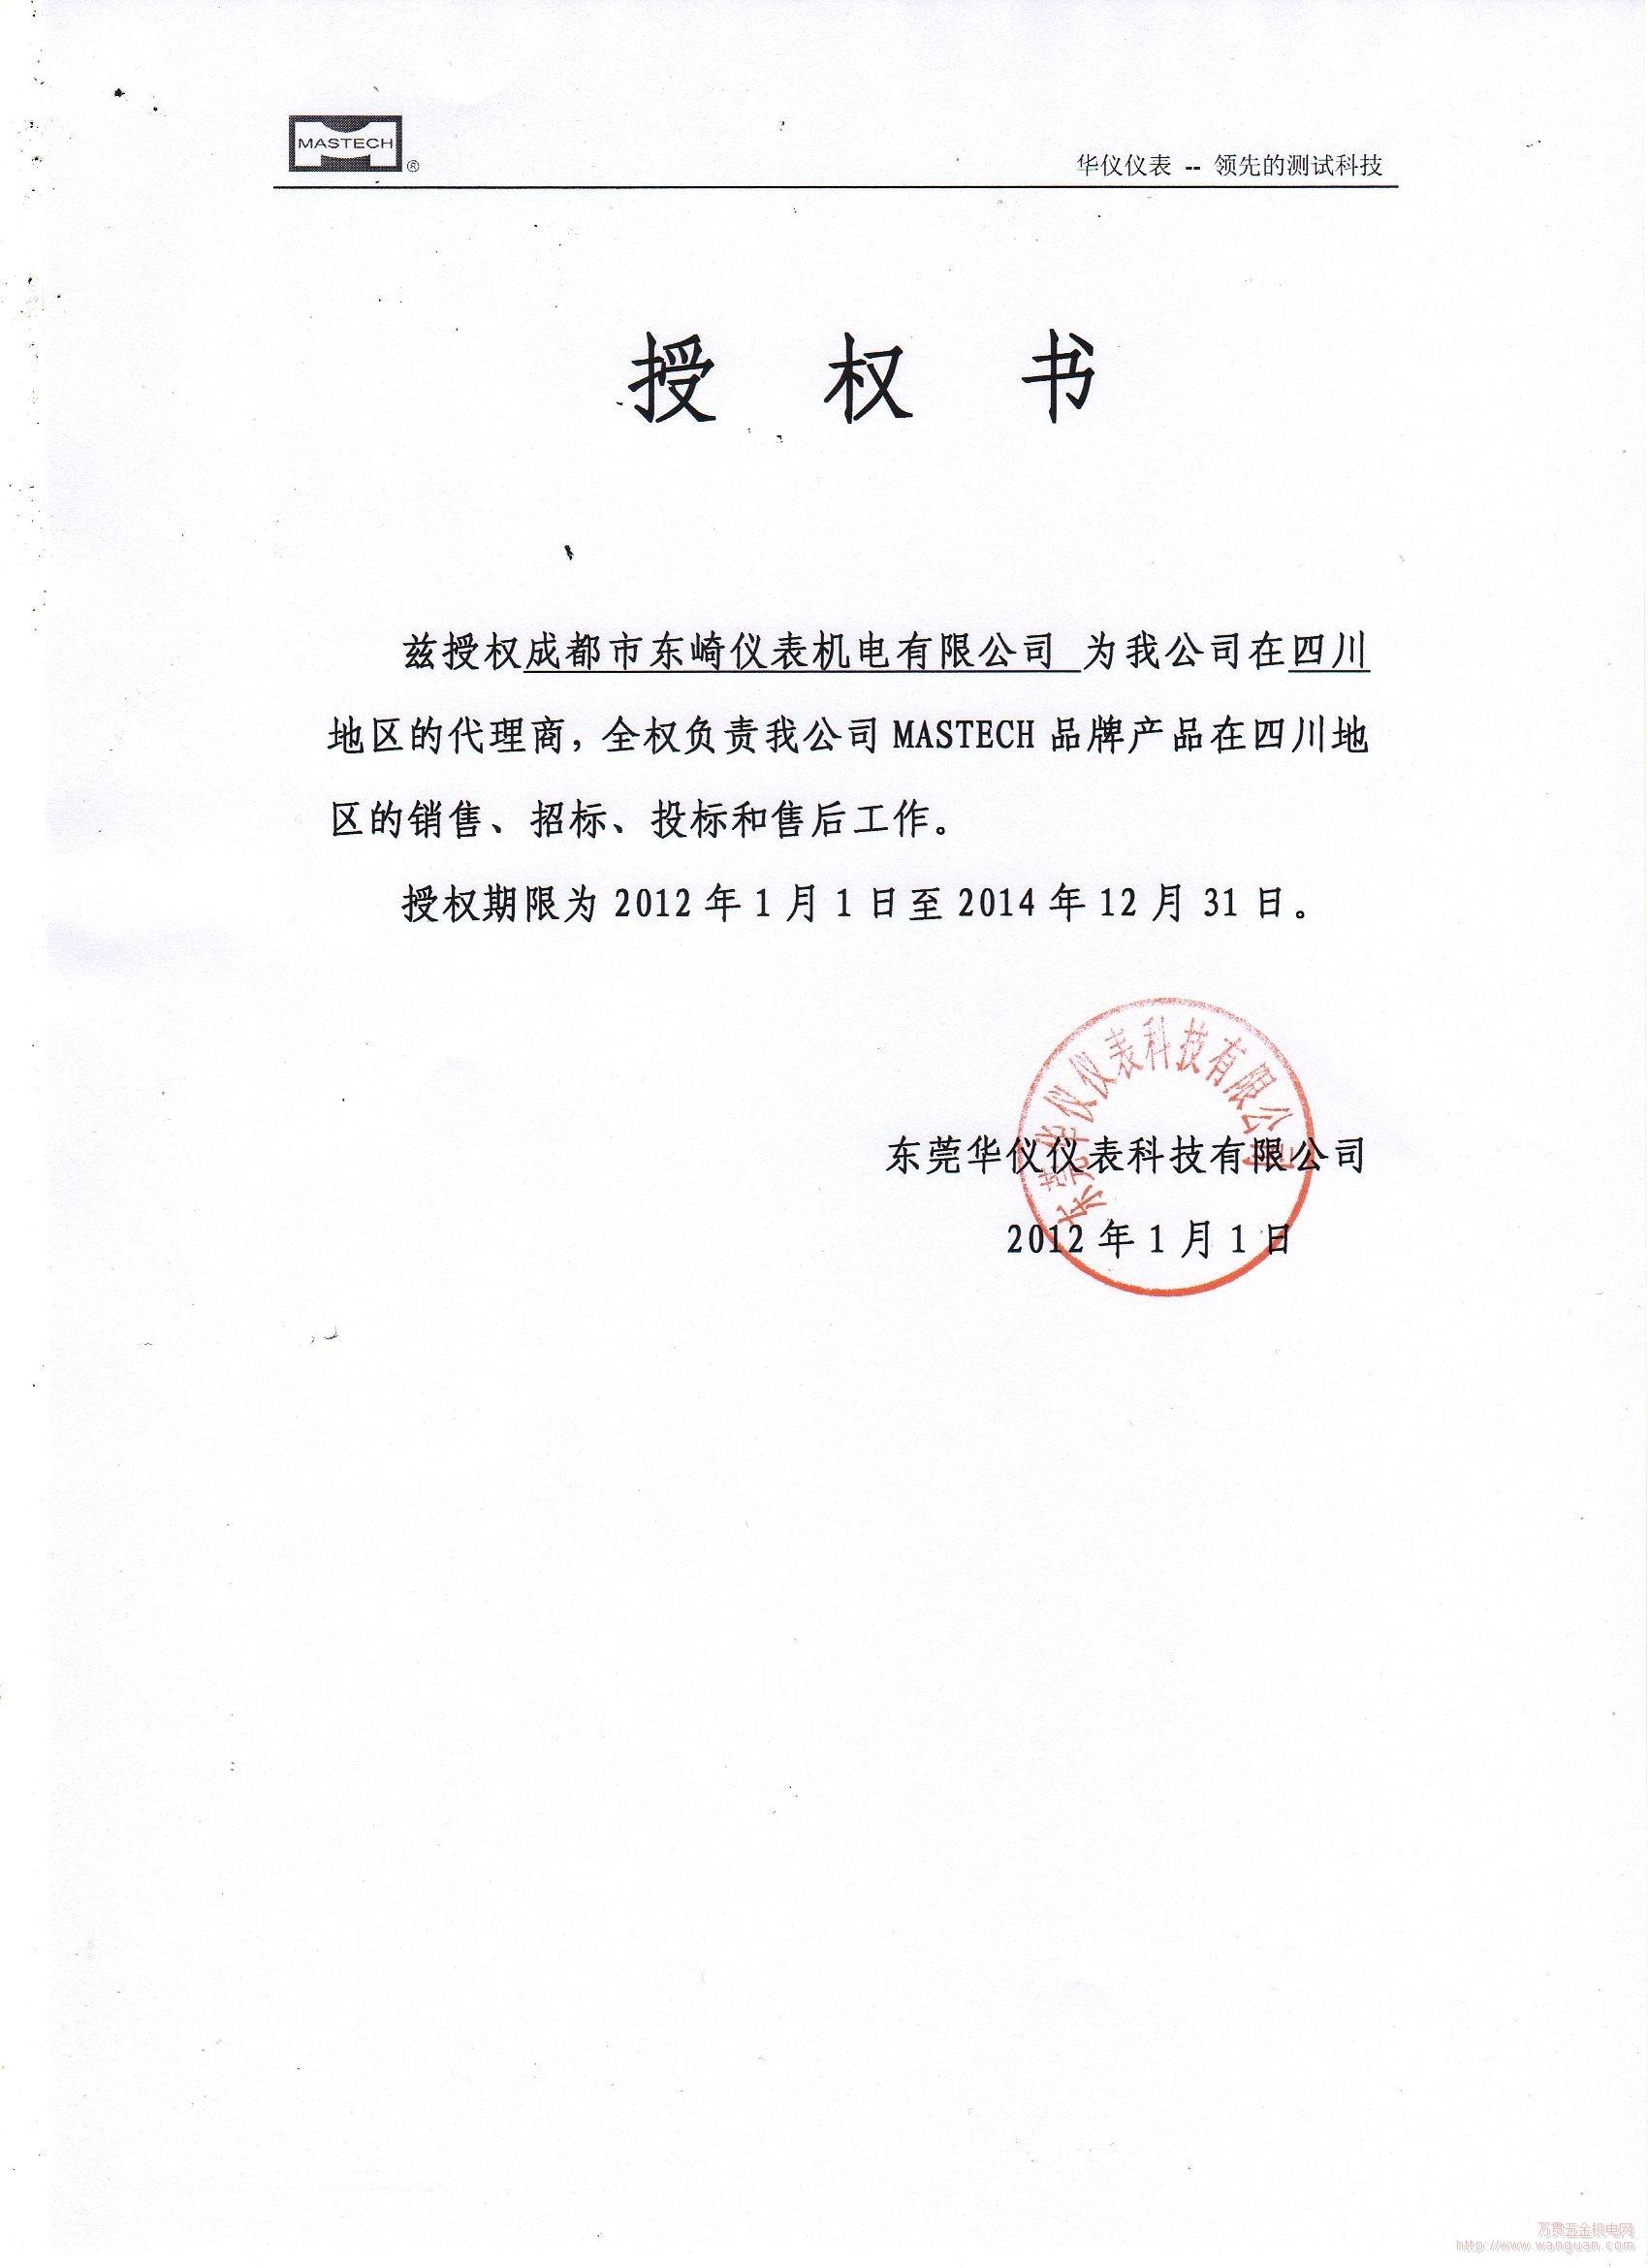 mastech品牌四川地区代理授权书图片